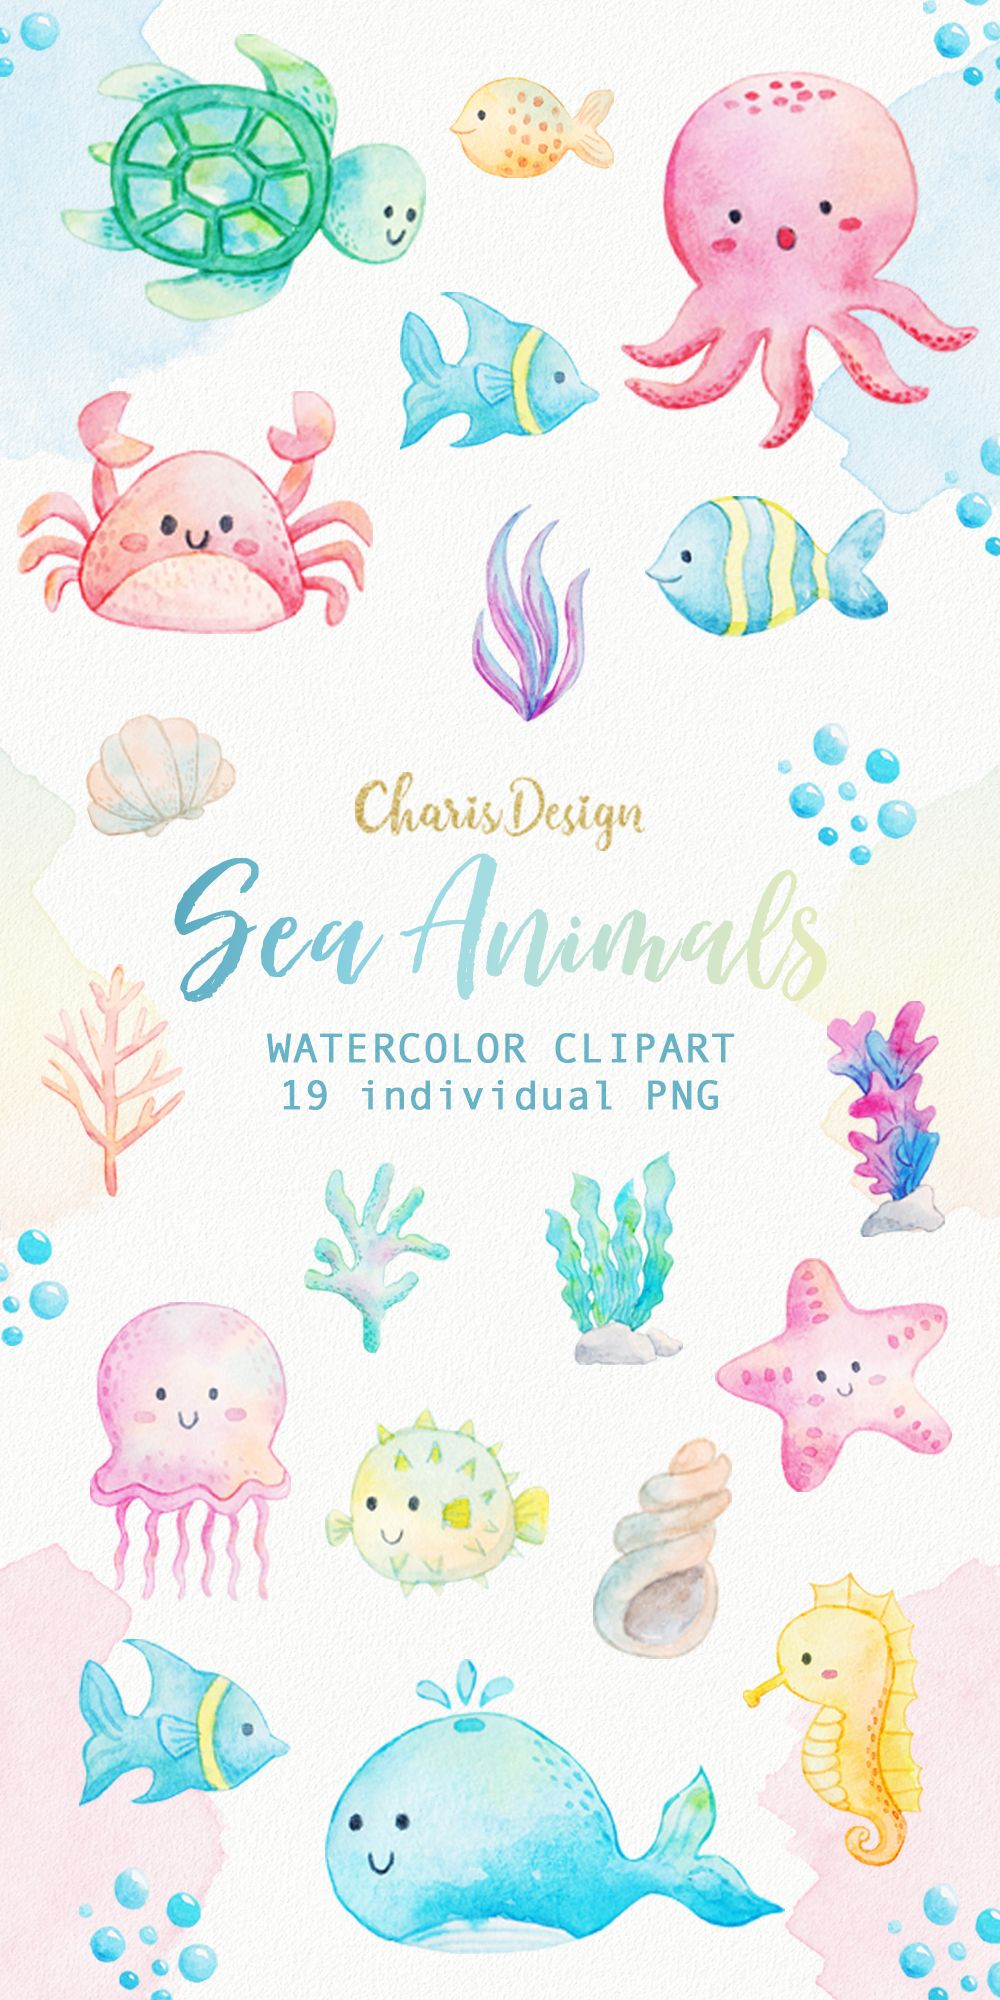 Sea Animals Watercolor Clipart Ocean Seaweed Underwater Fishes Starfish Sea Nautical Undersea Aquarium Babyshower Alga Sea Animals Drawings Watercolor Animals Watercolor Sea